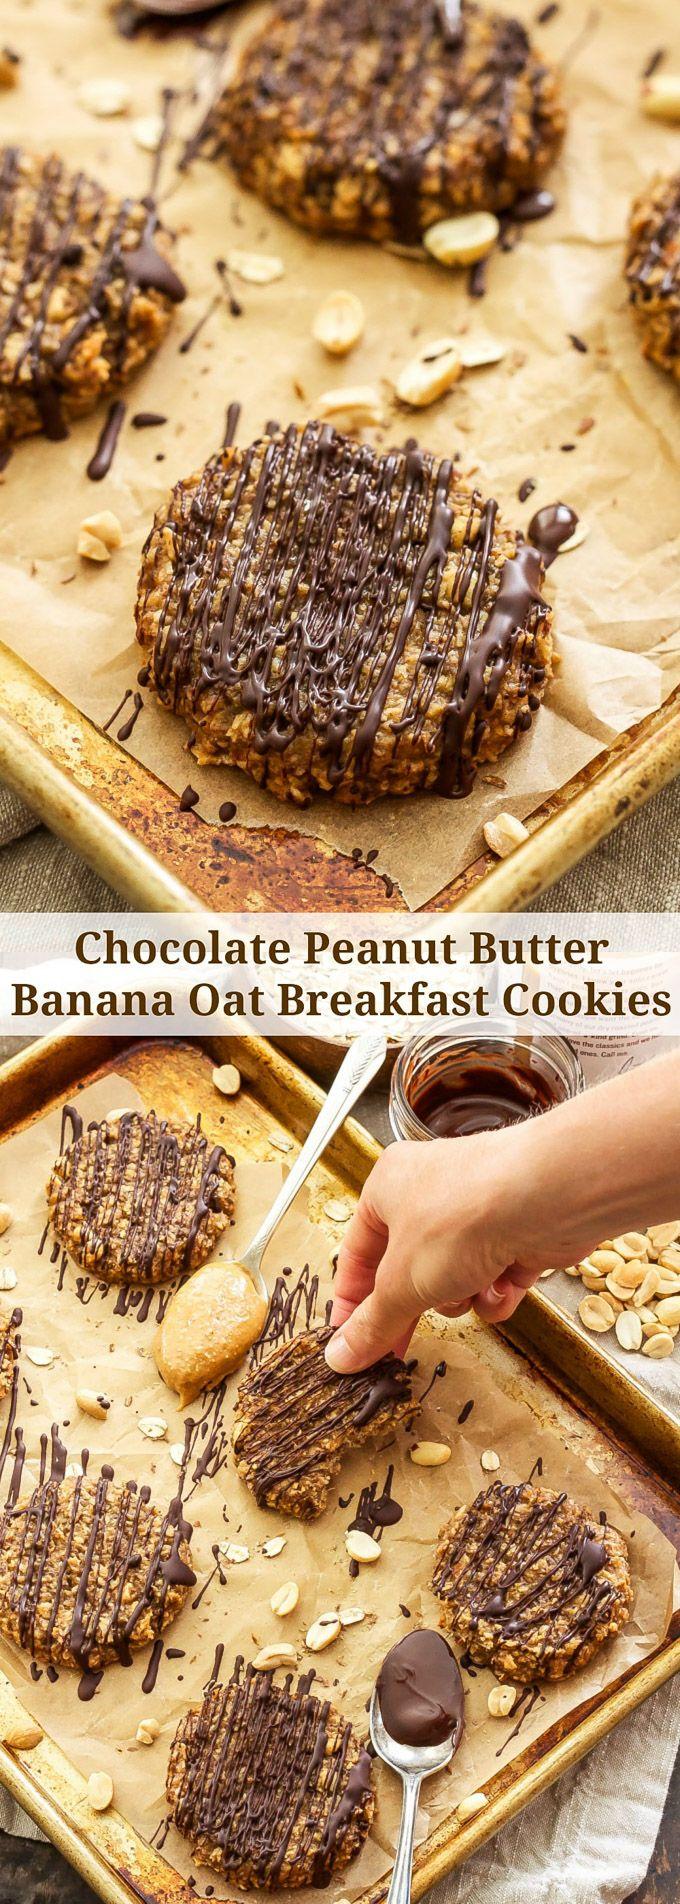 Chocolate Peanut Butter Banana Oat Breakfast Cookies | These tasty, gluten-free…